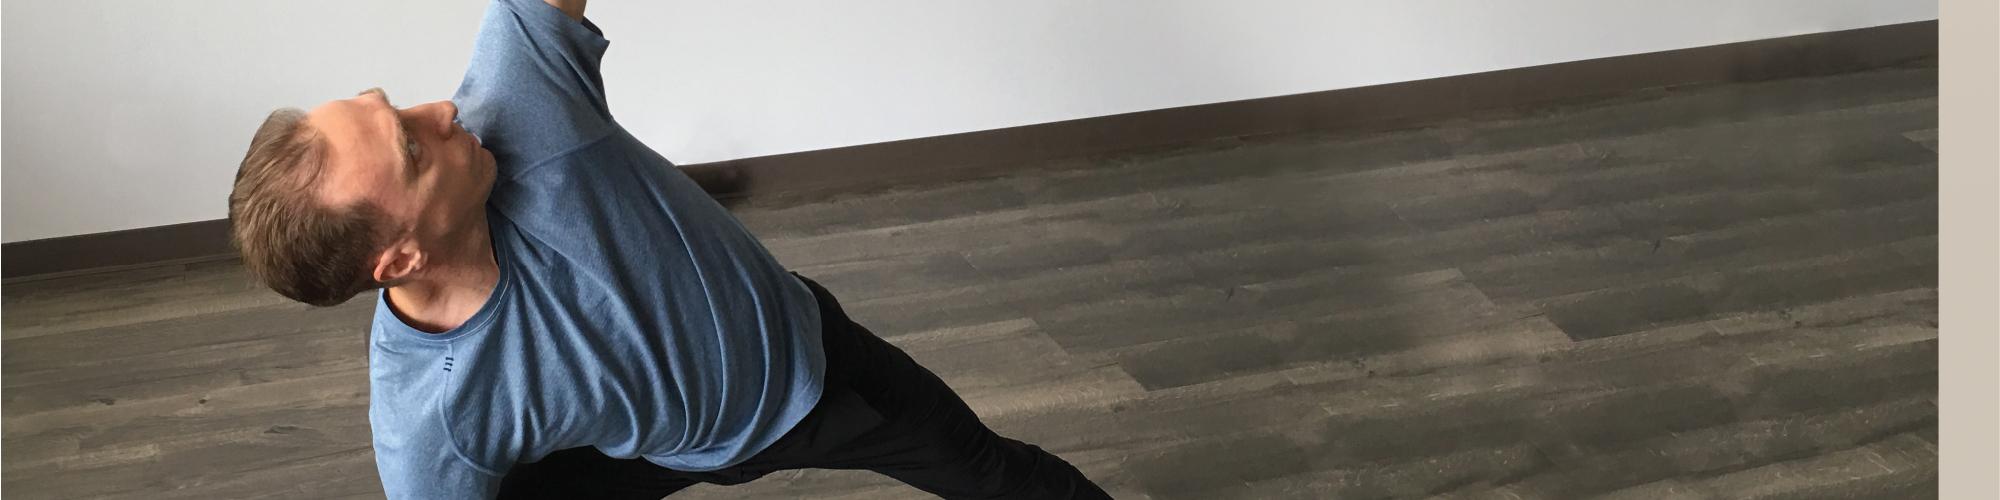 Hot Yoga Basics with Brian Keith